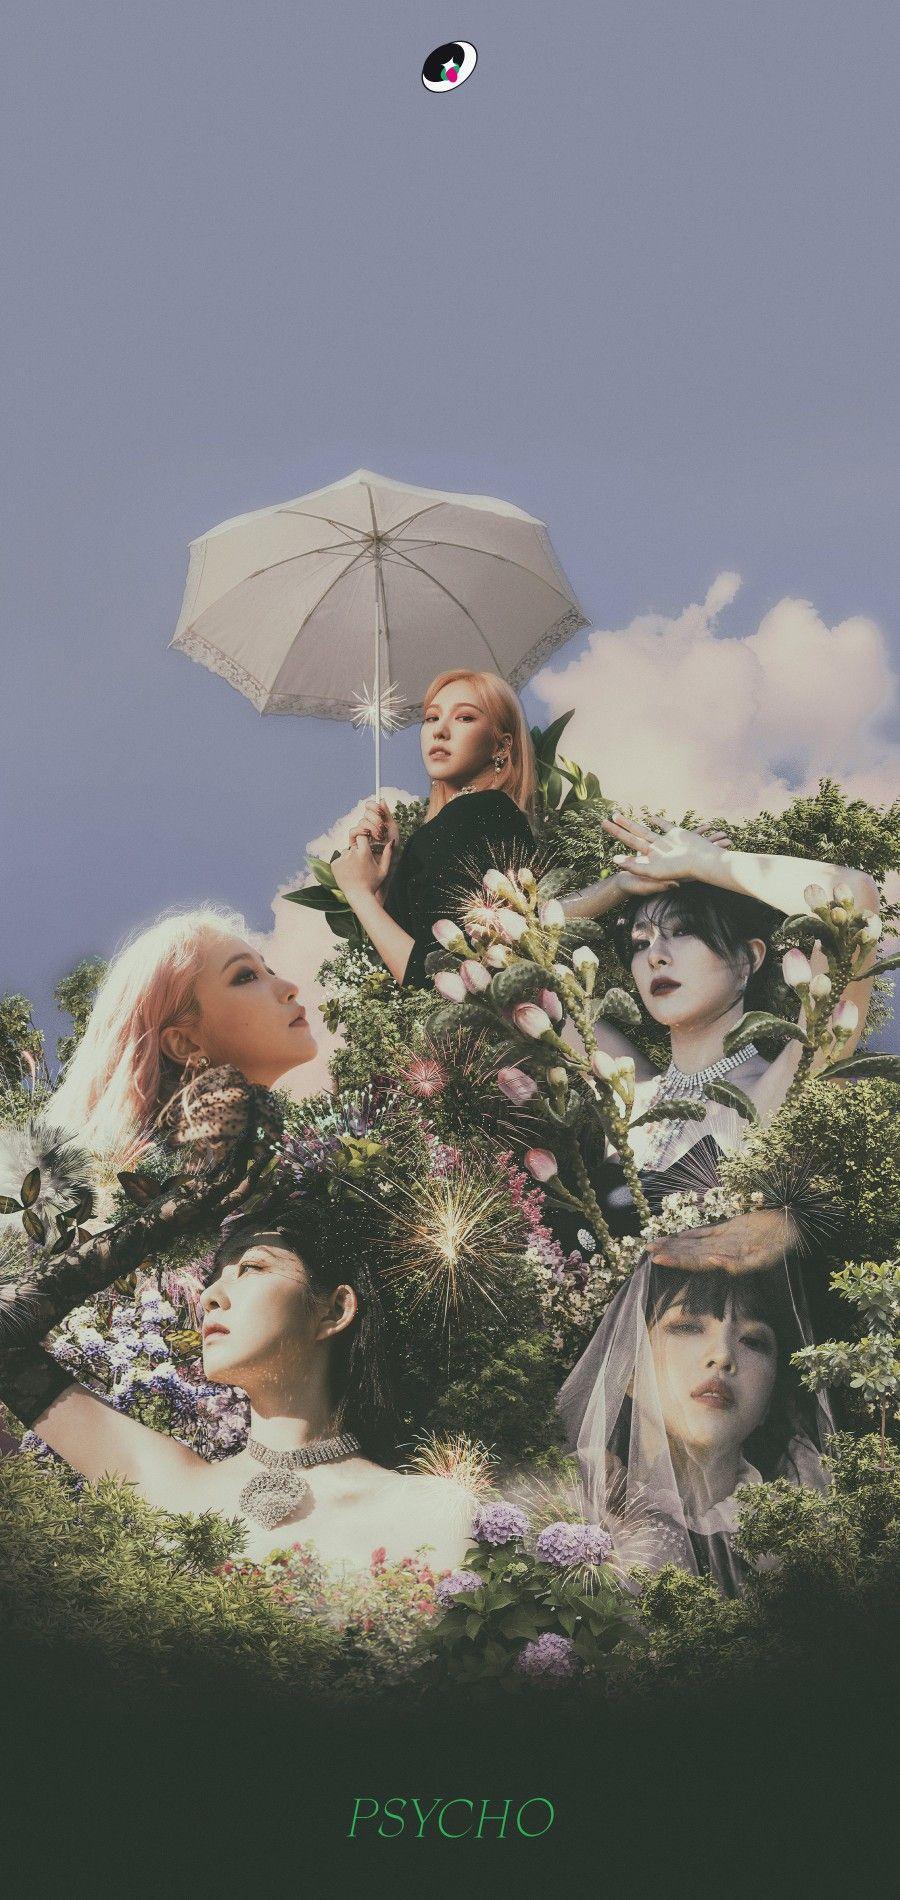 Red Velvet Lockscreen Gambar Fotografi Gambar Karakter